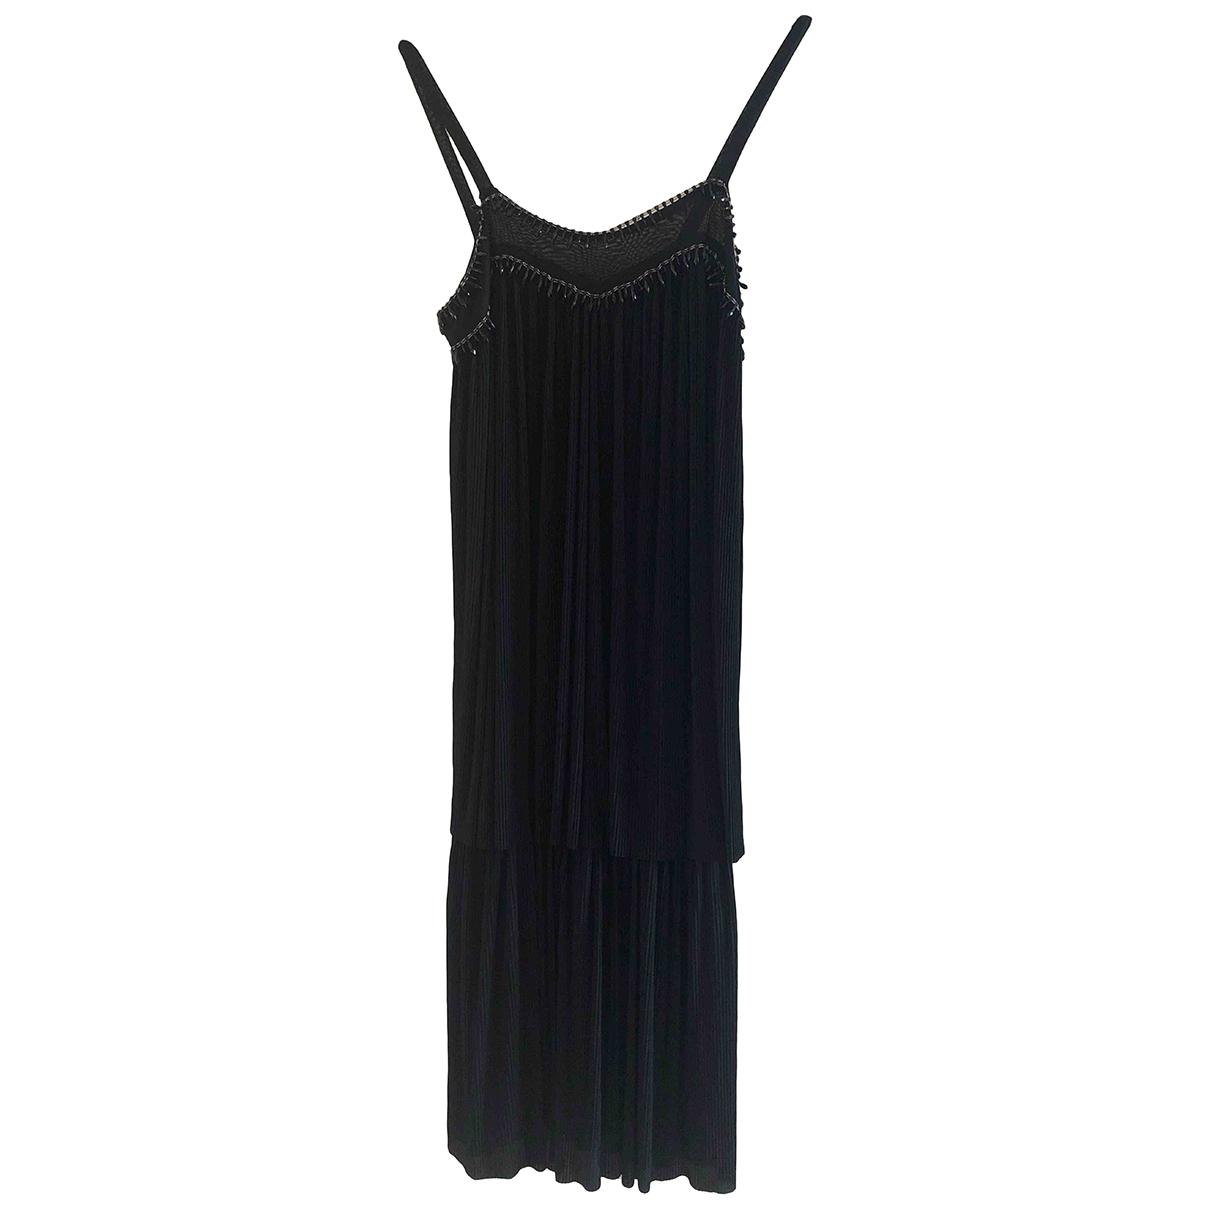 Sonia Rykiel \N Black dress for Women 36 FR